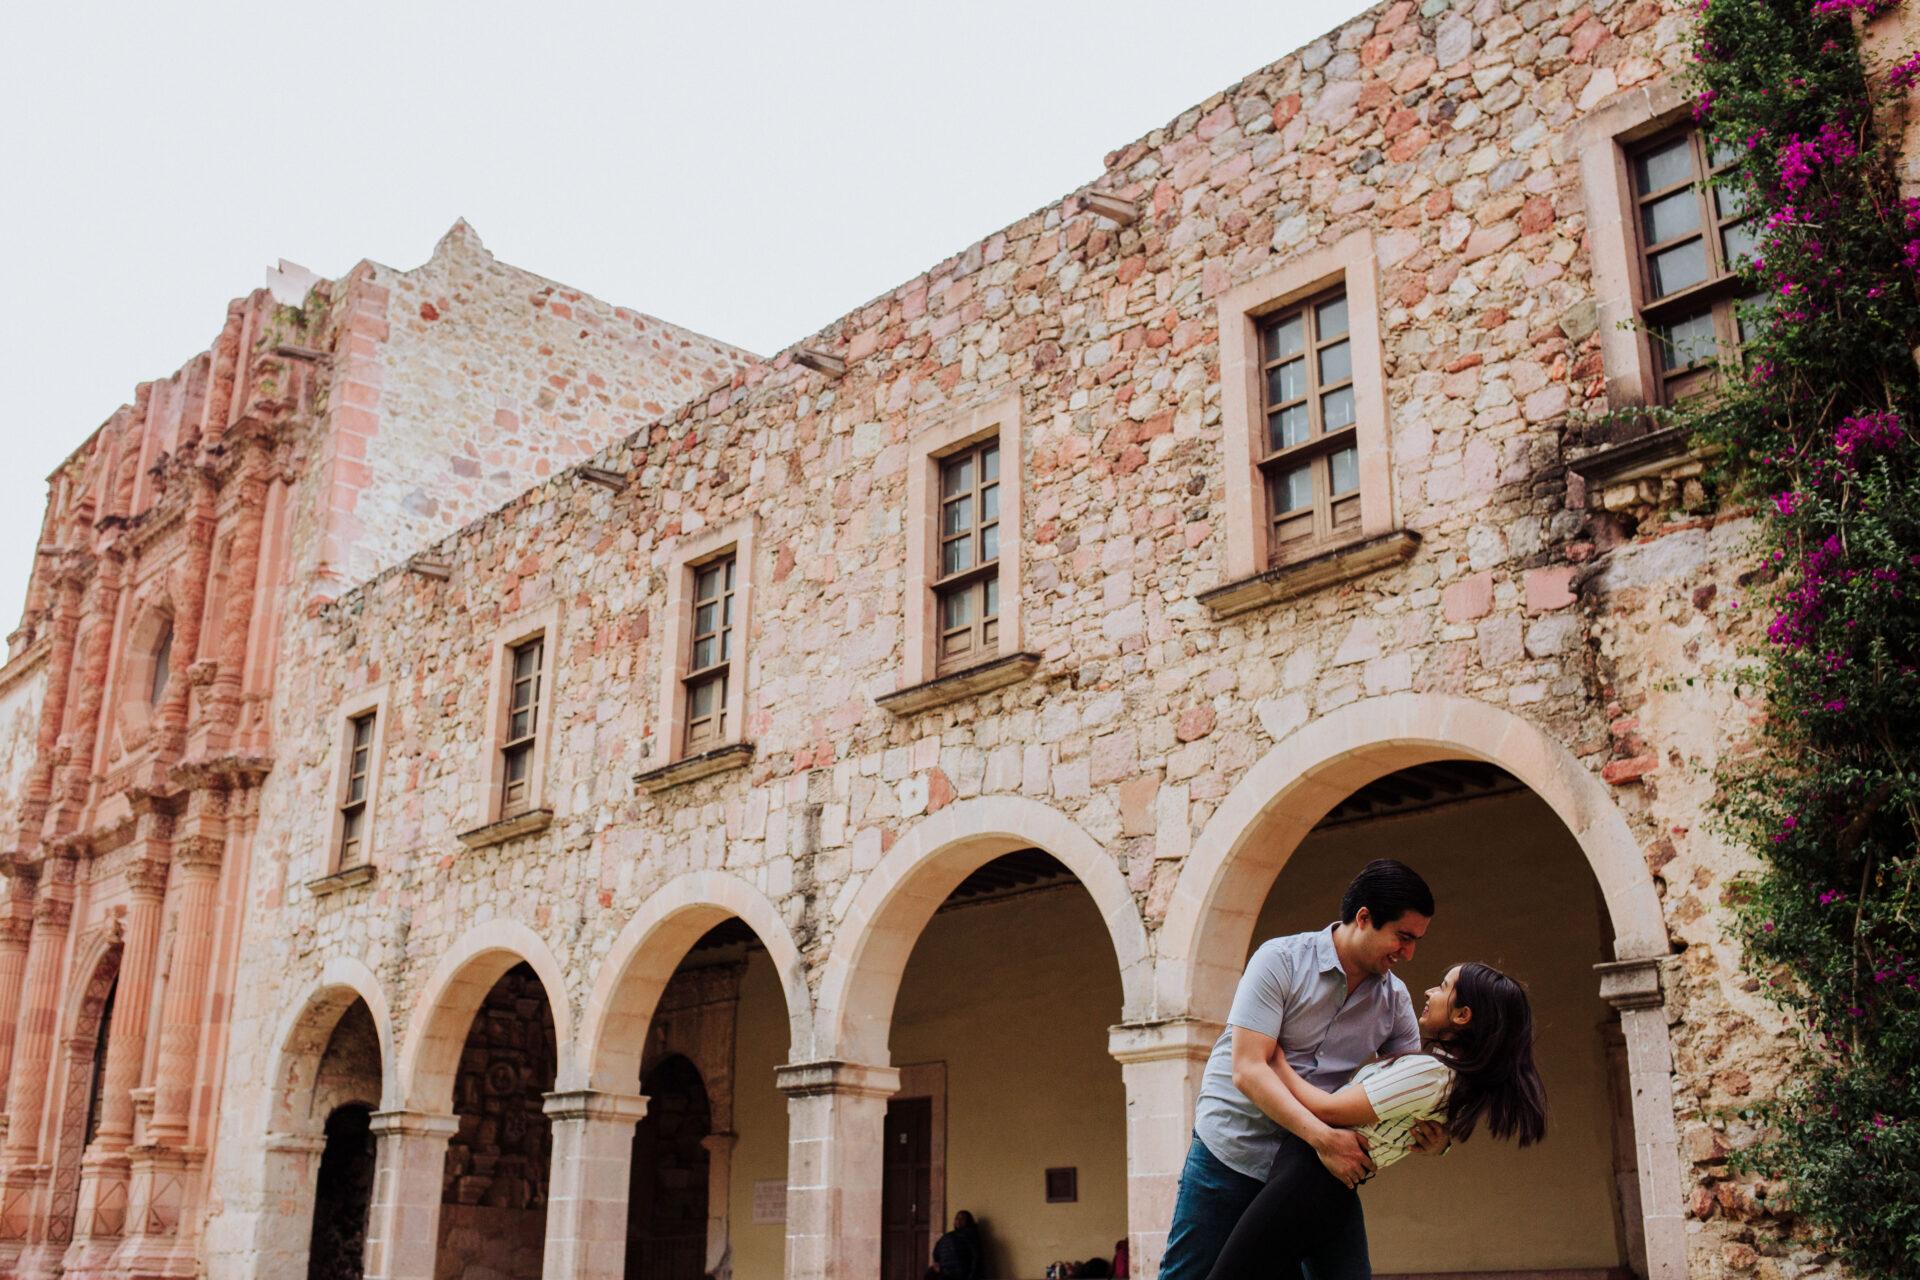 javier_noriega_fotografo_bodas_sesion_casual_zacatecas_wedding_photographer9